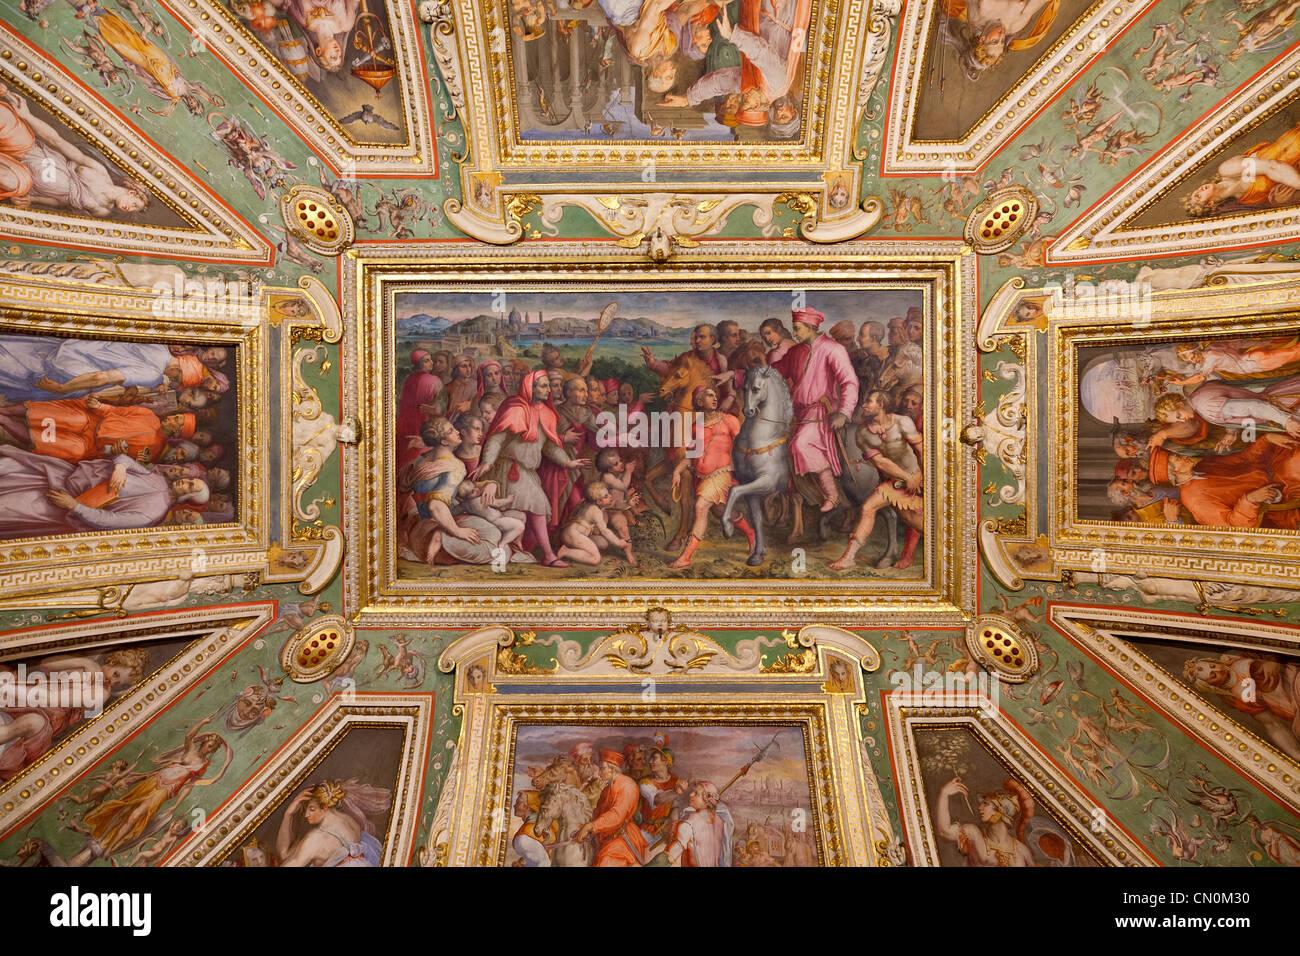 Europa, Italien, Florenz, Deckenplatte im Palazzo Vecchio, UNESCO-Weltkulturerbe, Stockbild